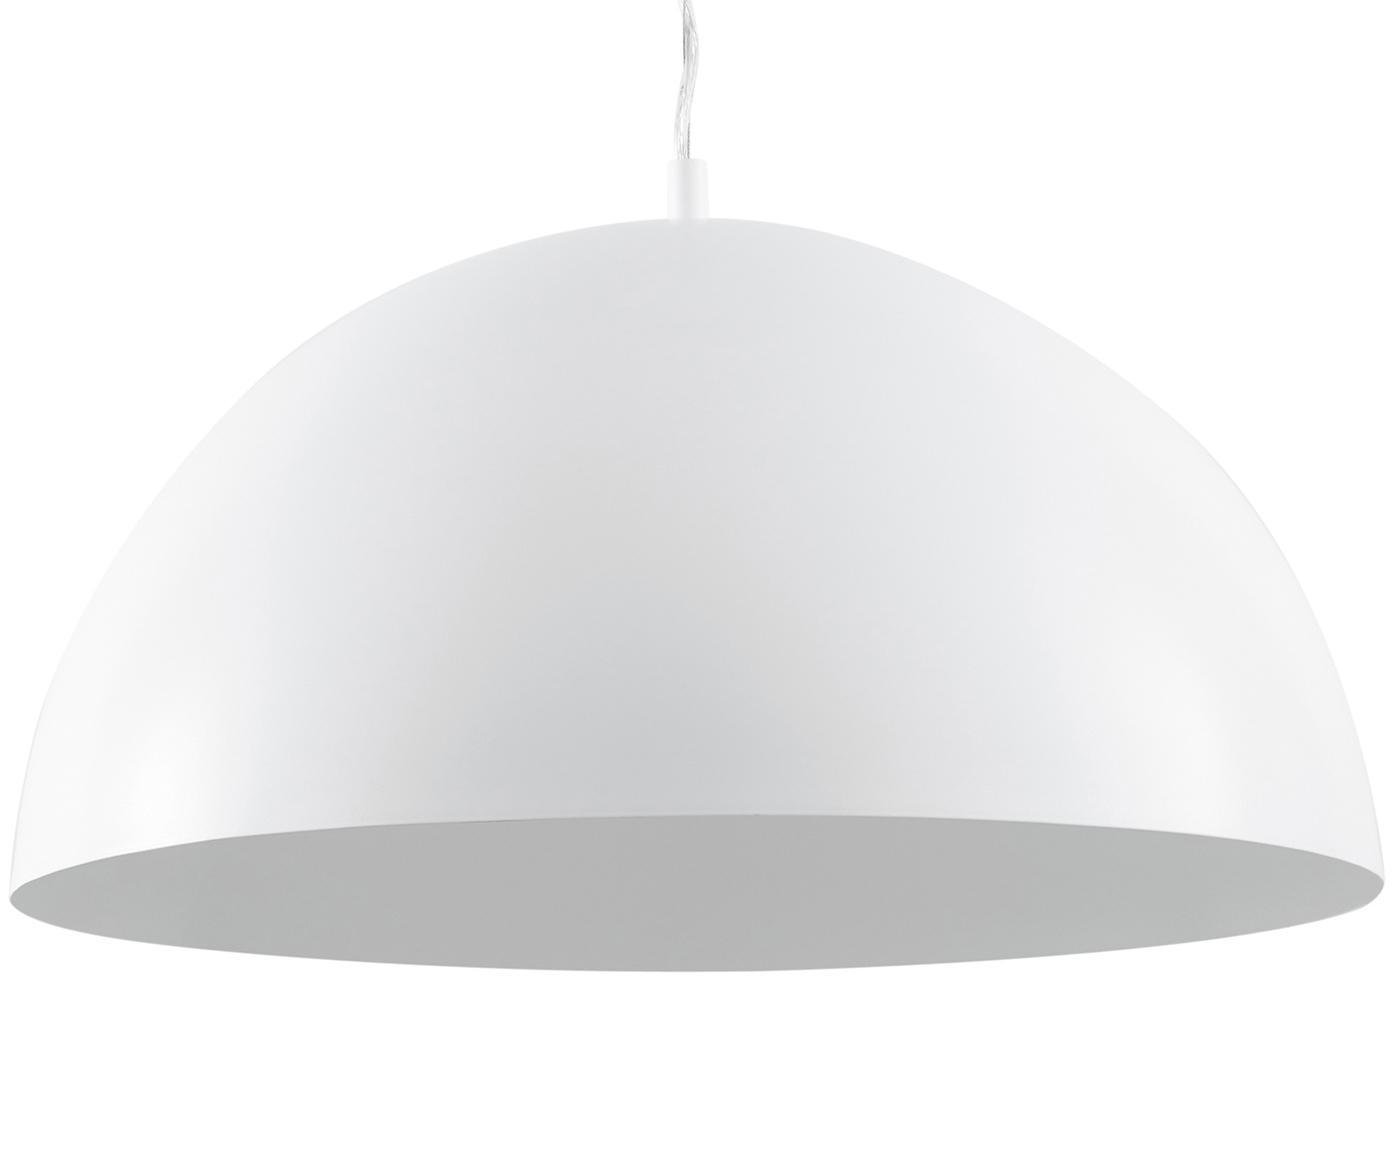 Lampada a sospensione Brad, Baldacchino: metallo verniciato a polv, Paralume: metallo verniciato a polv, Bianco, Ø 53 x Alt. 25 cm